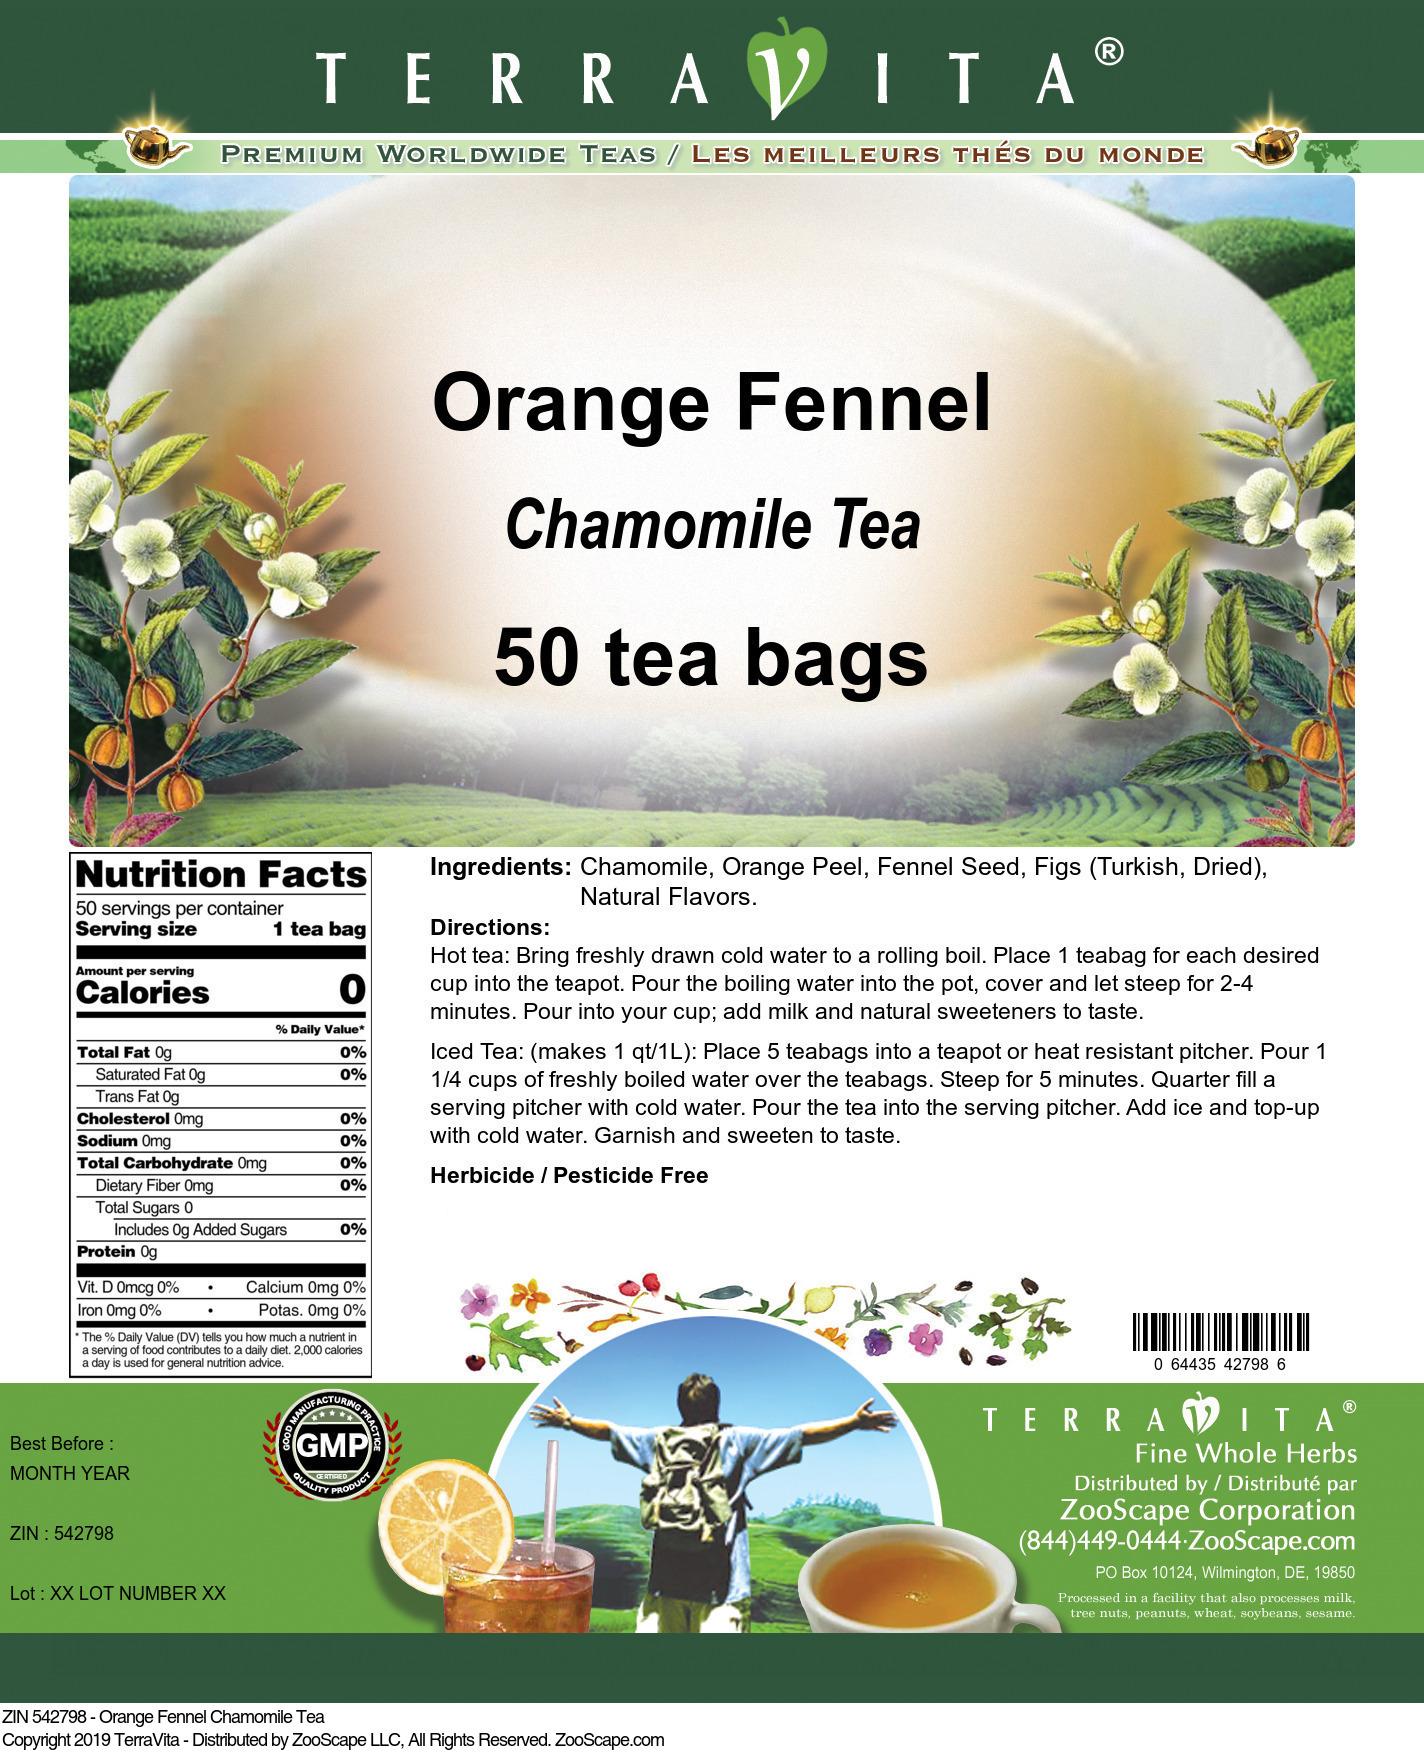 Orange Fennel Chamomile Tea